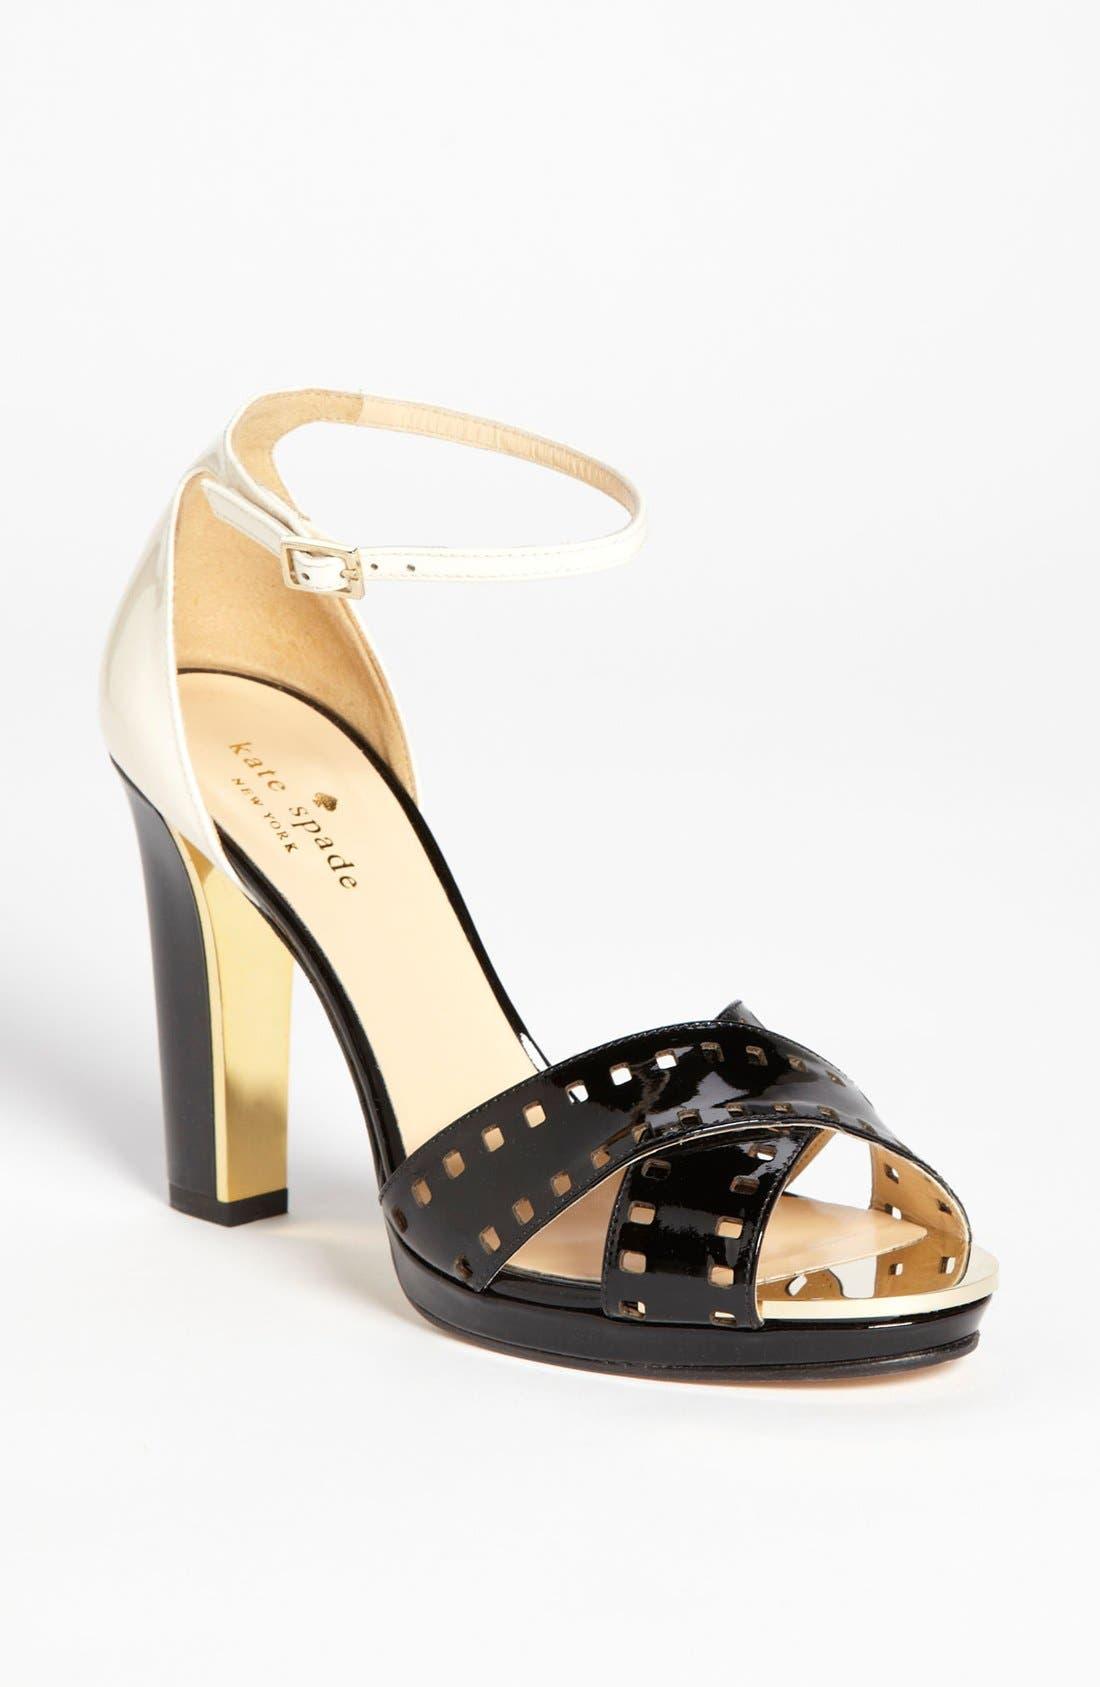 Main Image - kate spade new york 'fresia' sandal